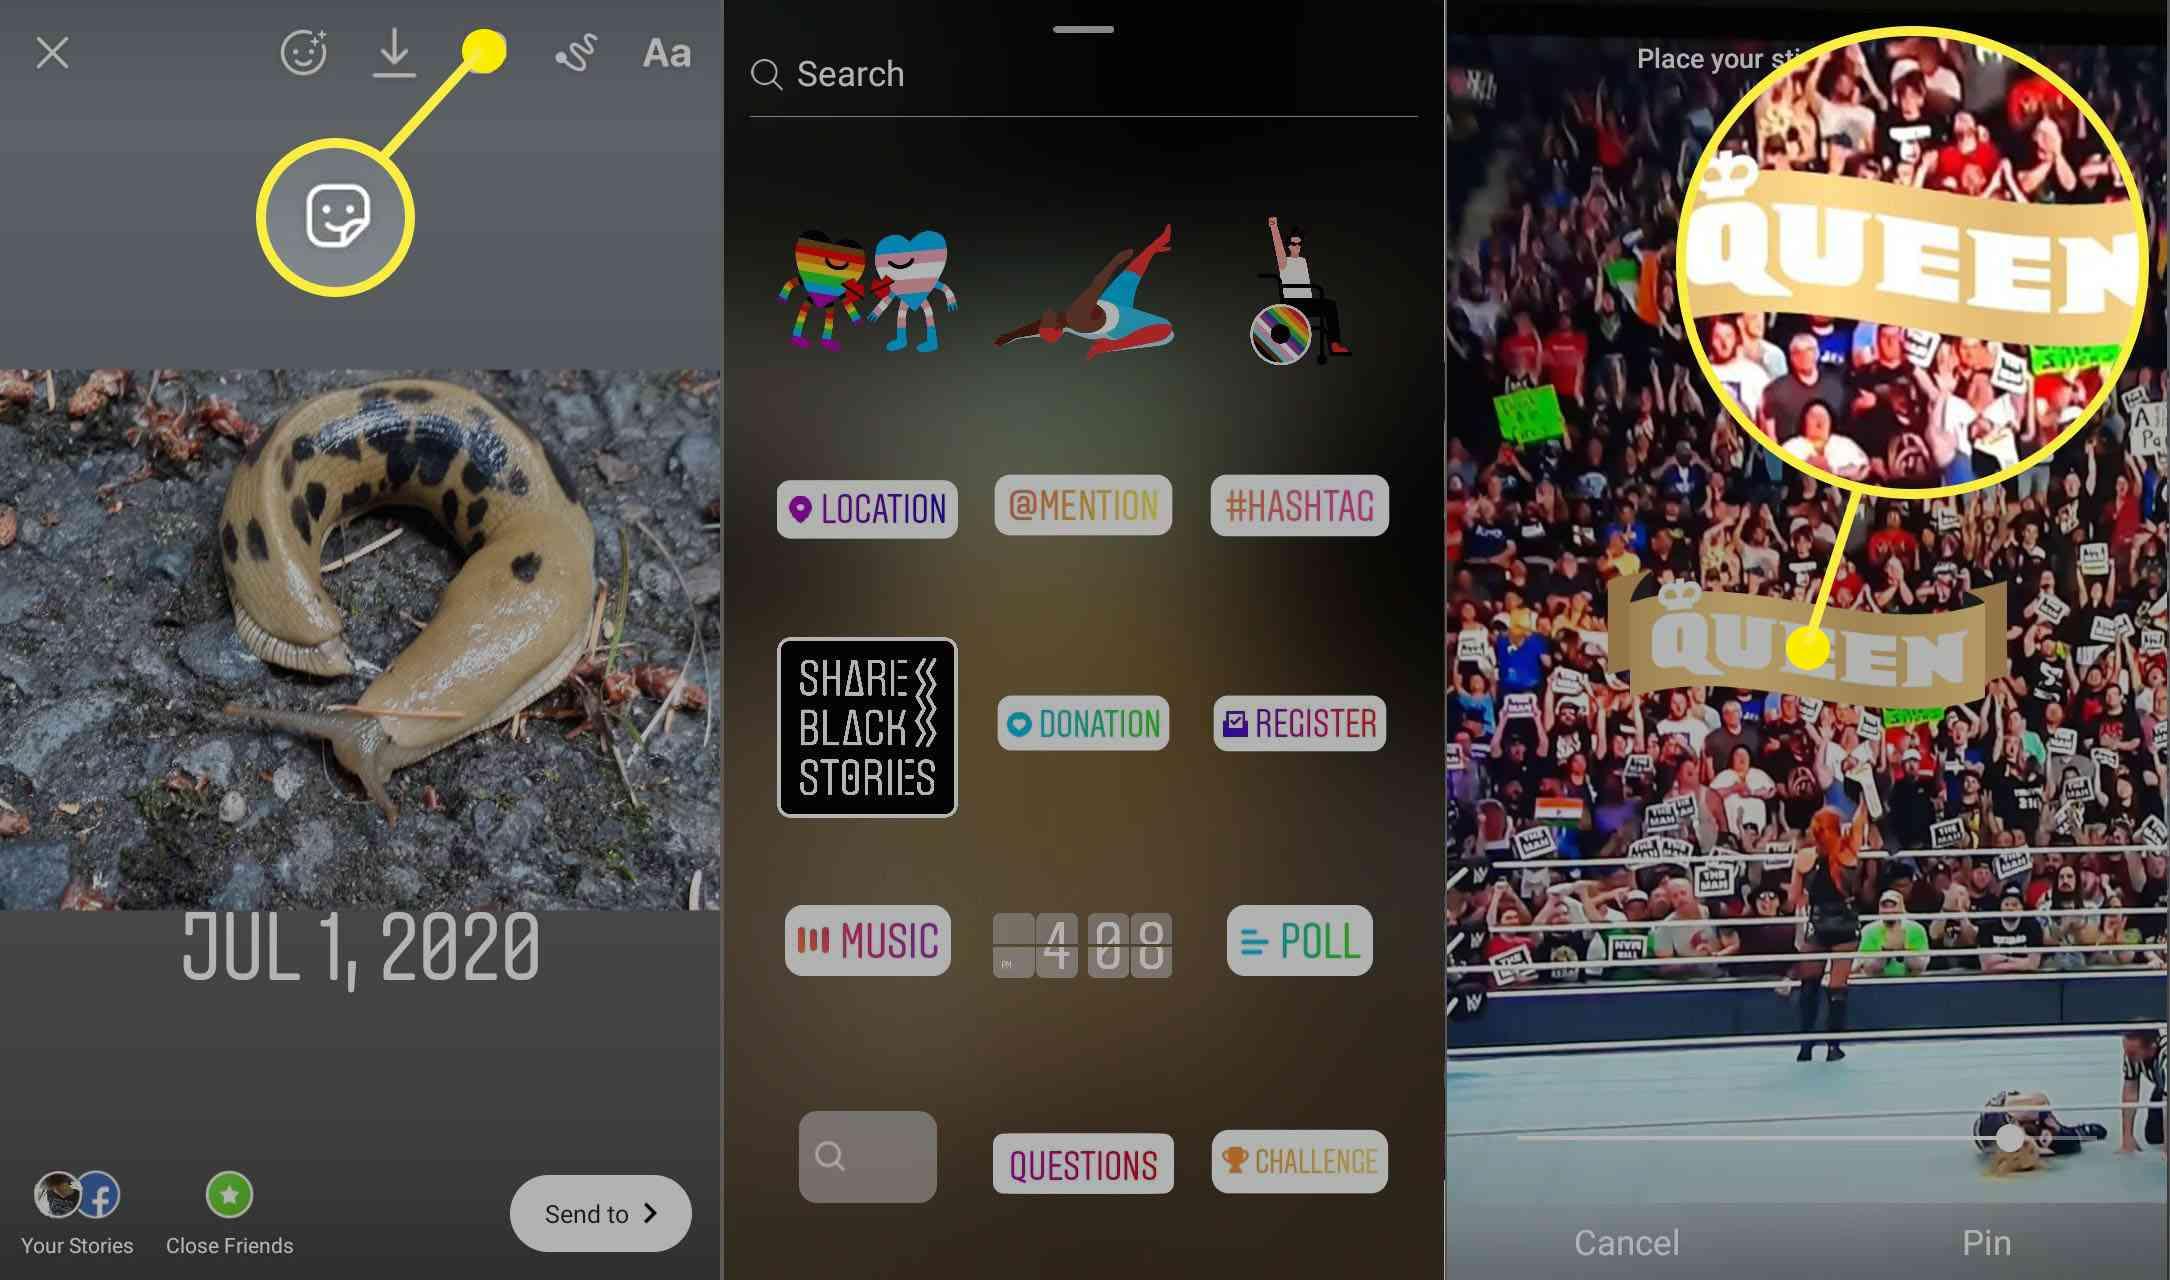 Screenshots of sticker options for Instagram stories.